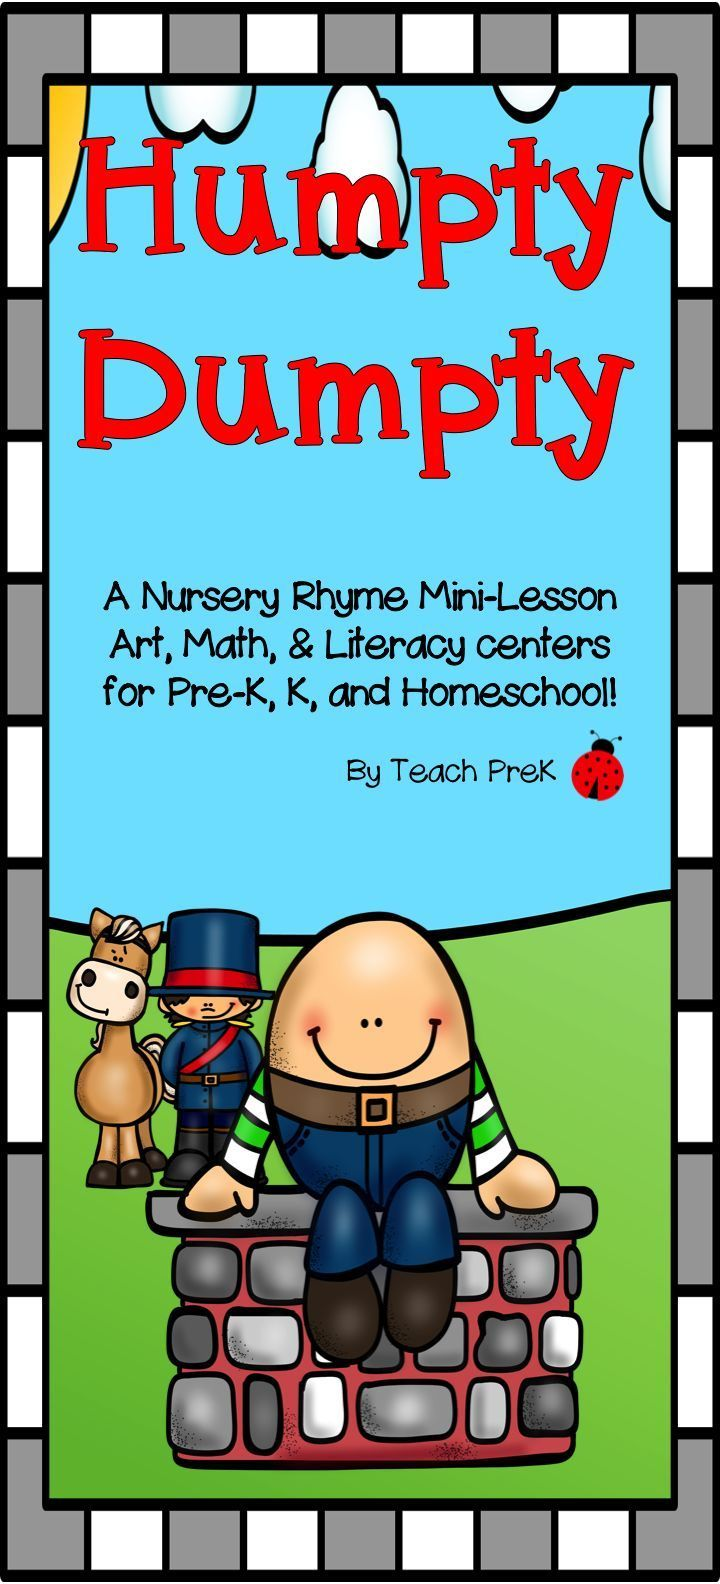 Humpty Dumpty Mini-Lesson for PreK, K & Homeschool | Humpty dumpty ...